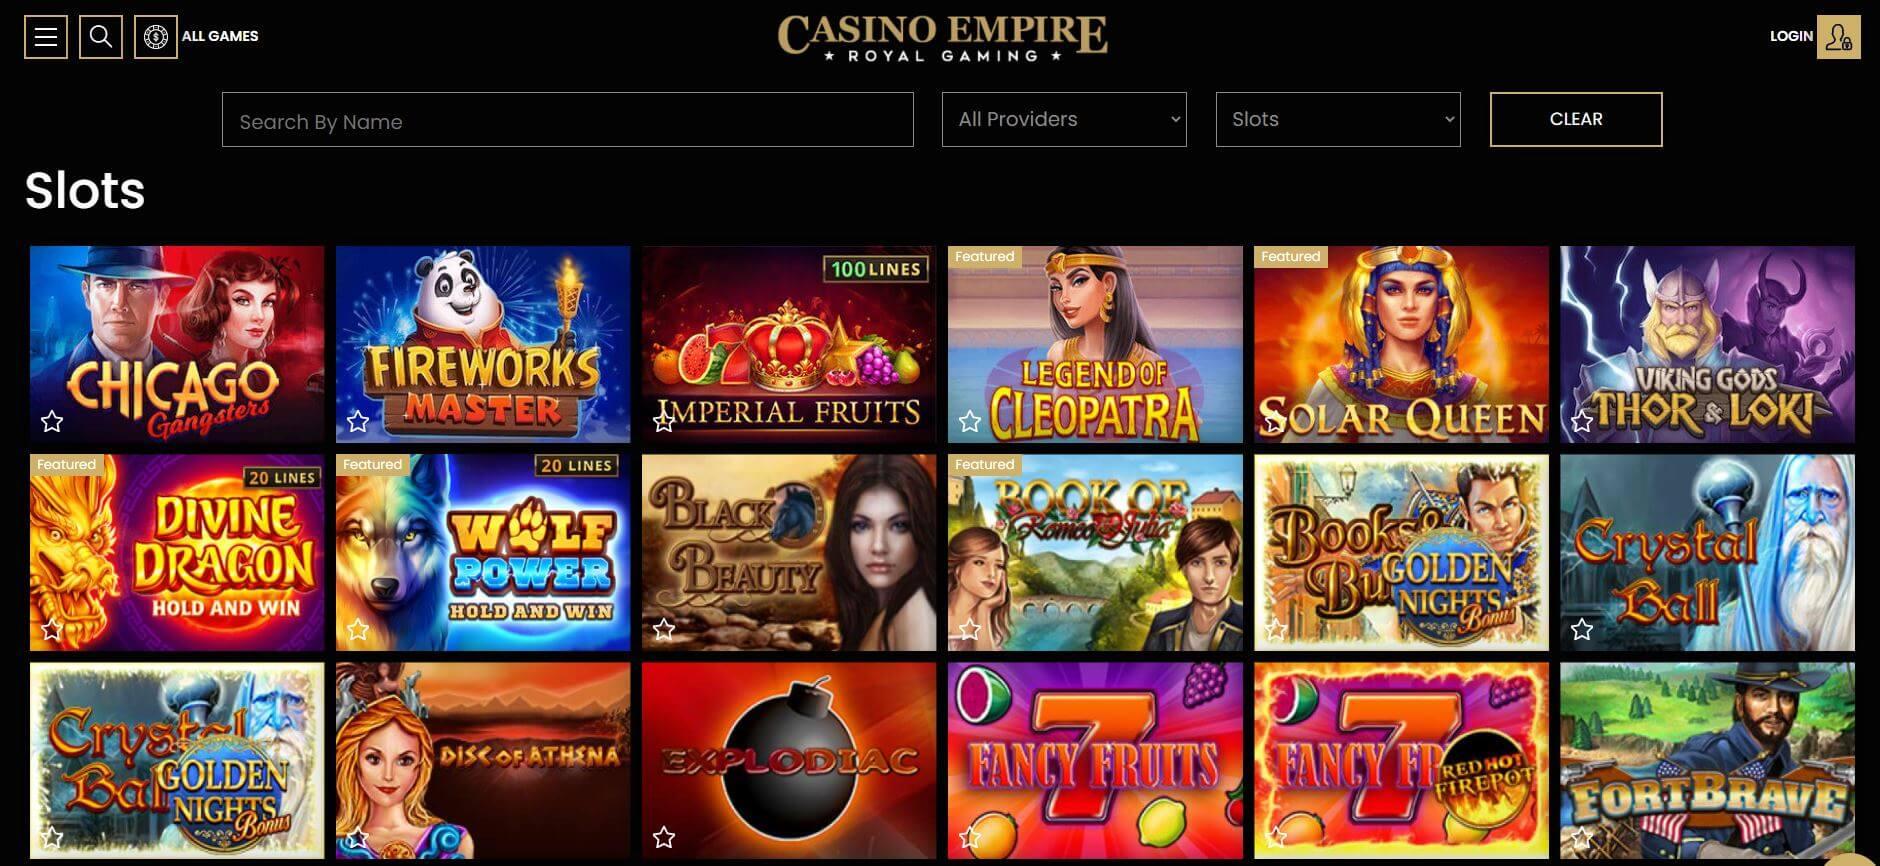 Casino Empire Slots